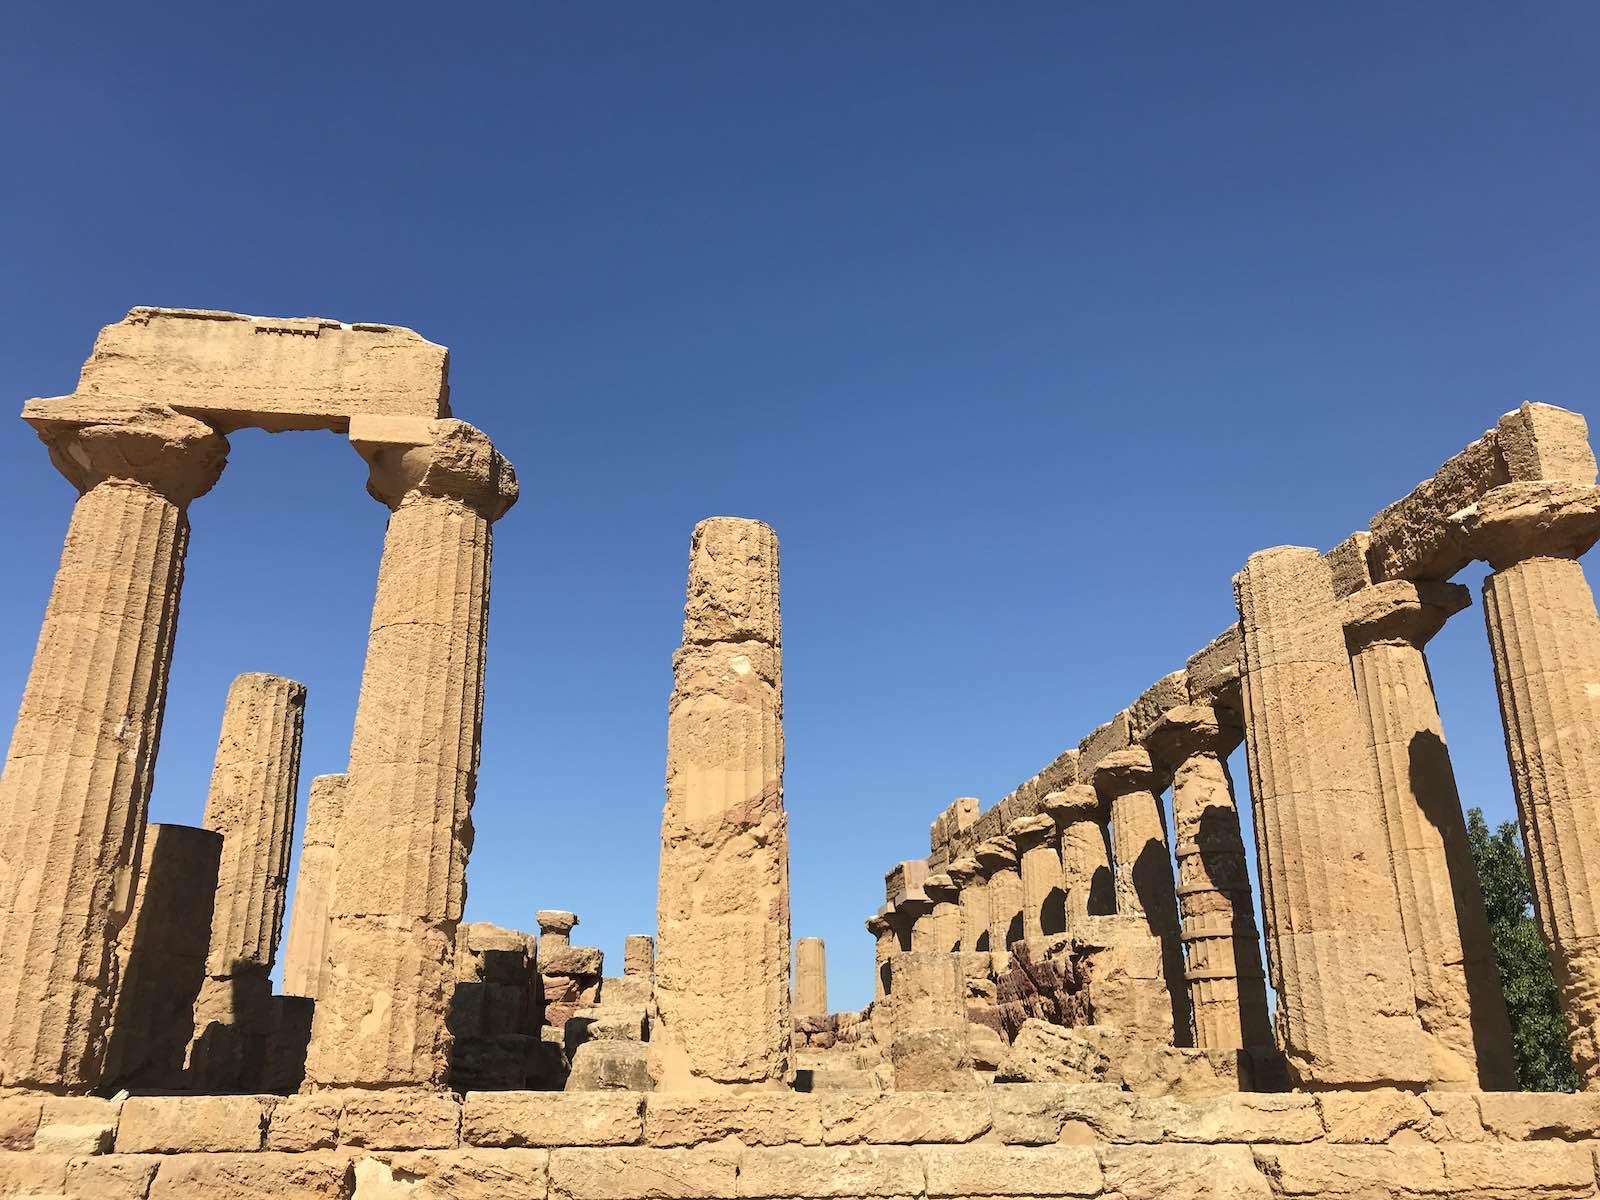 Temple of Hera or Juno